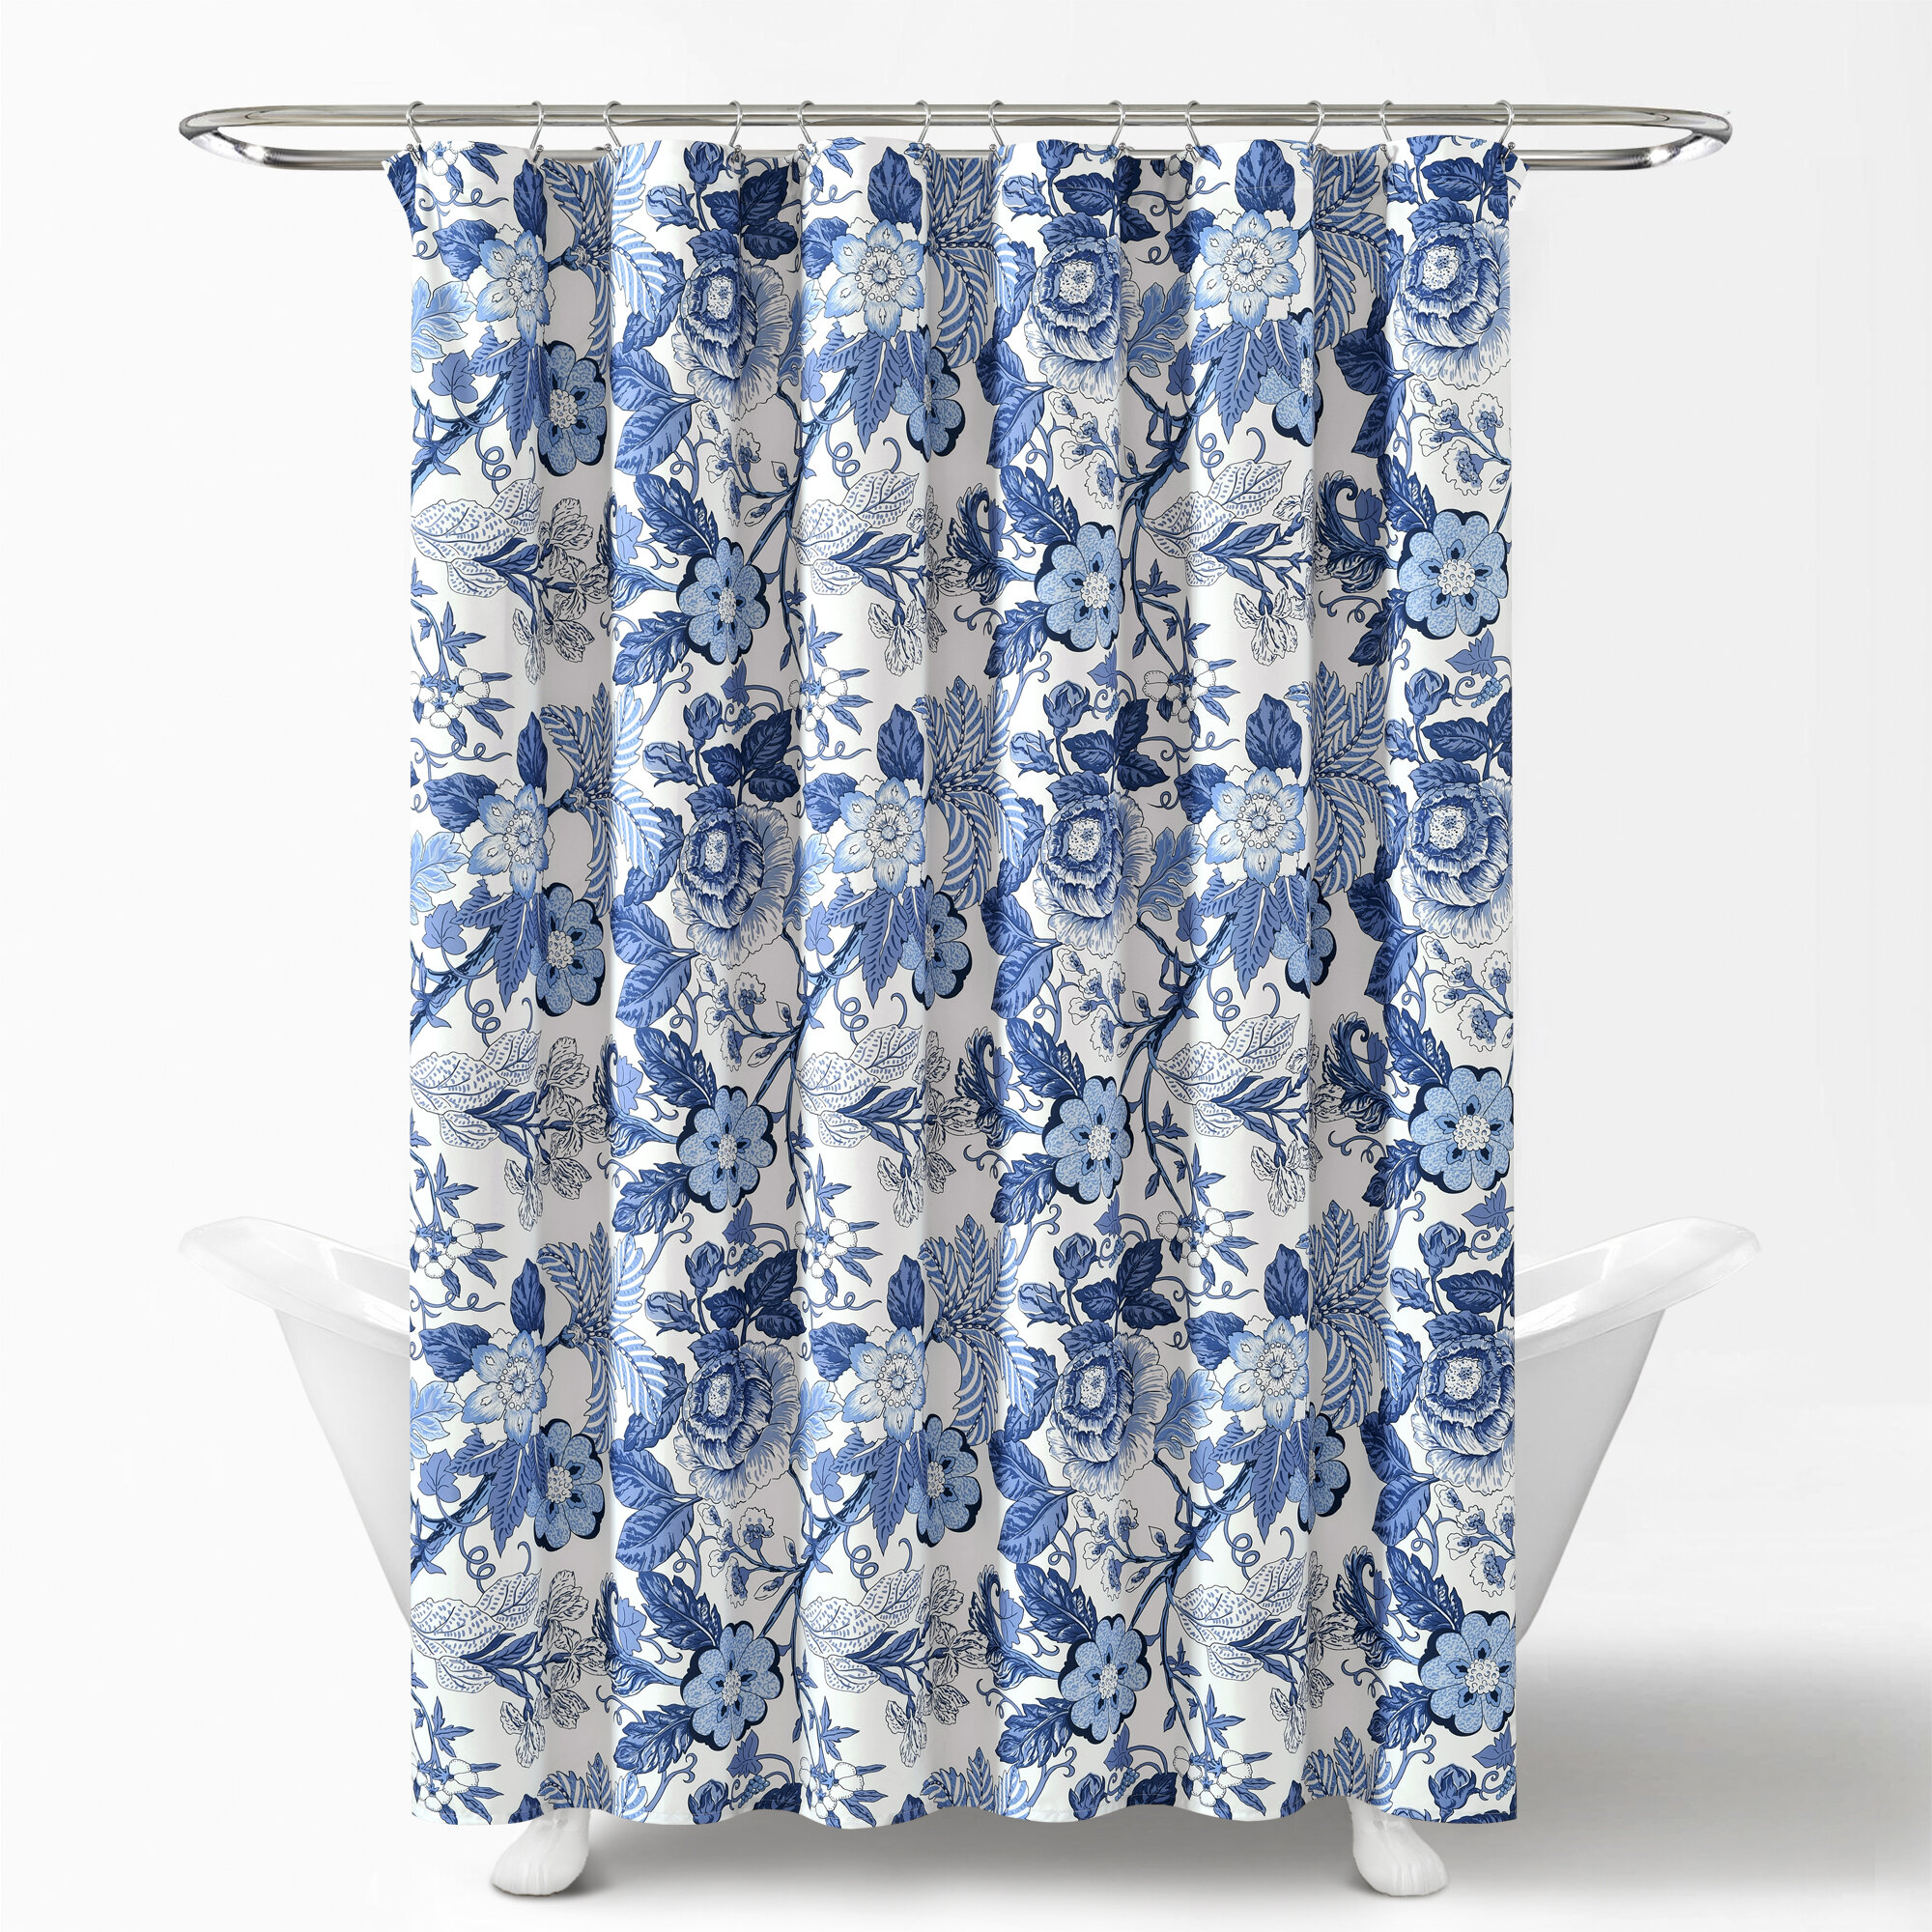 Red Barrel Studio Dellaposta Floral Single Shower Curtain Reviews Wayfair